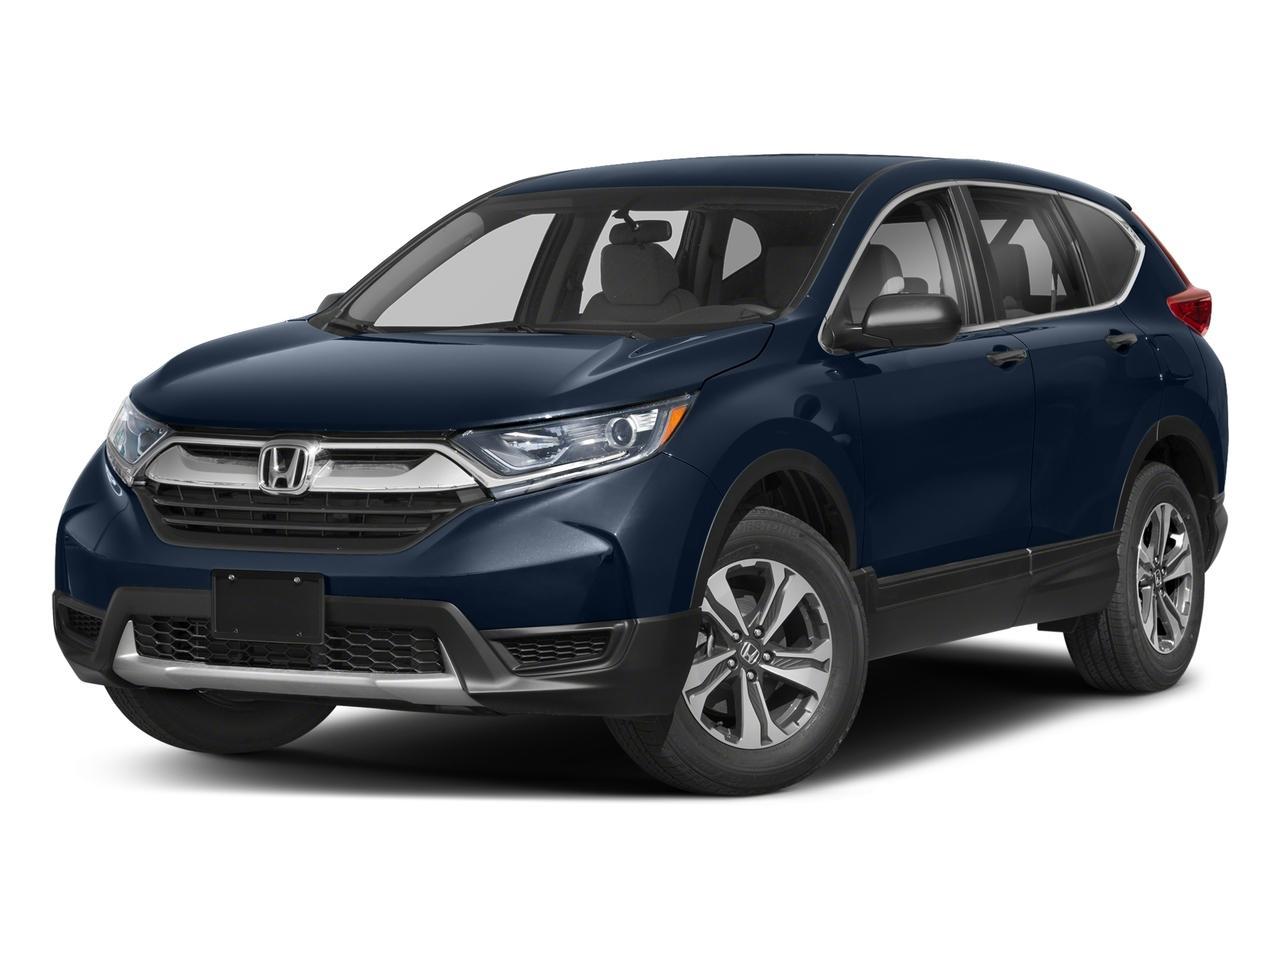 2018 Honda CR-V Vehicle Photo in Prince Frederick, MD 20678